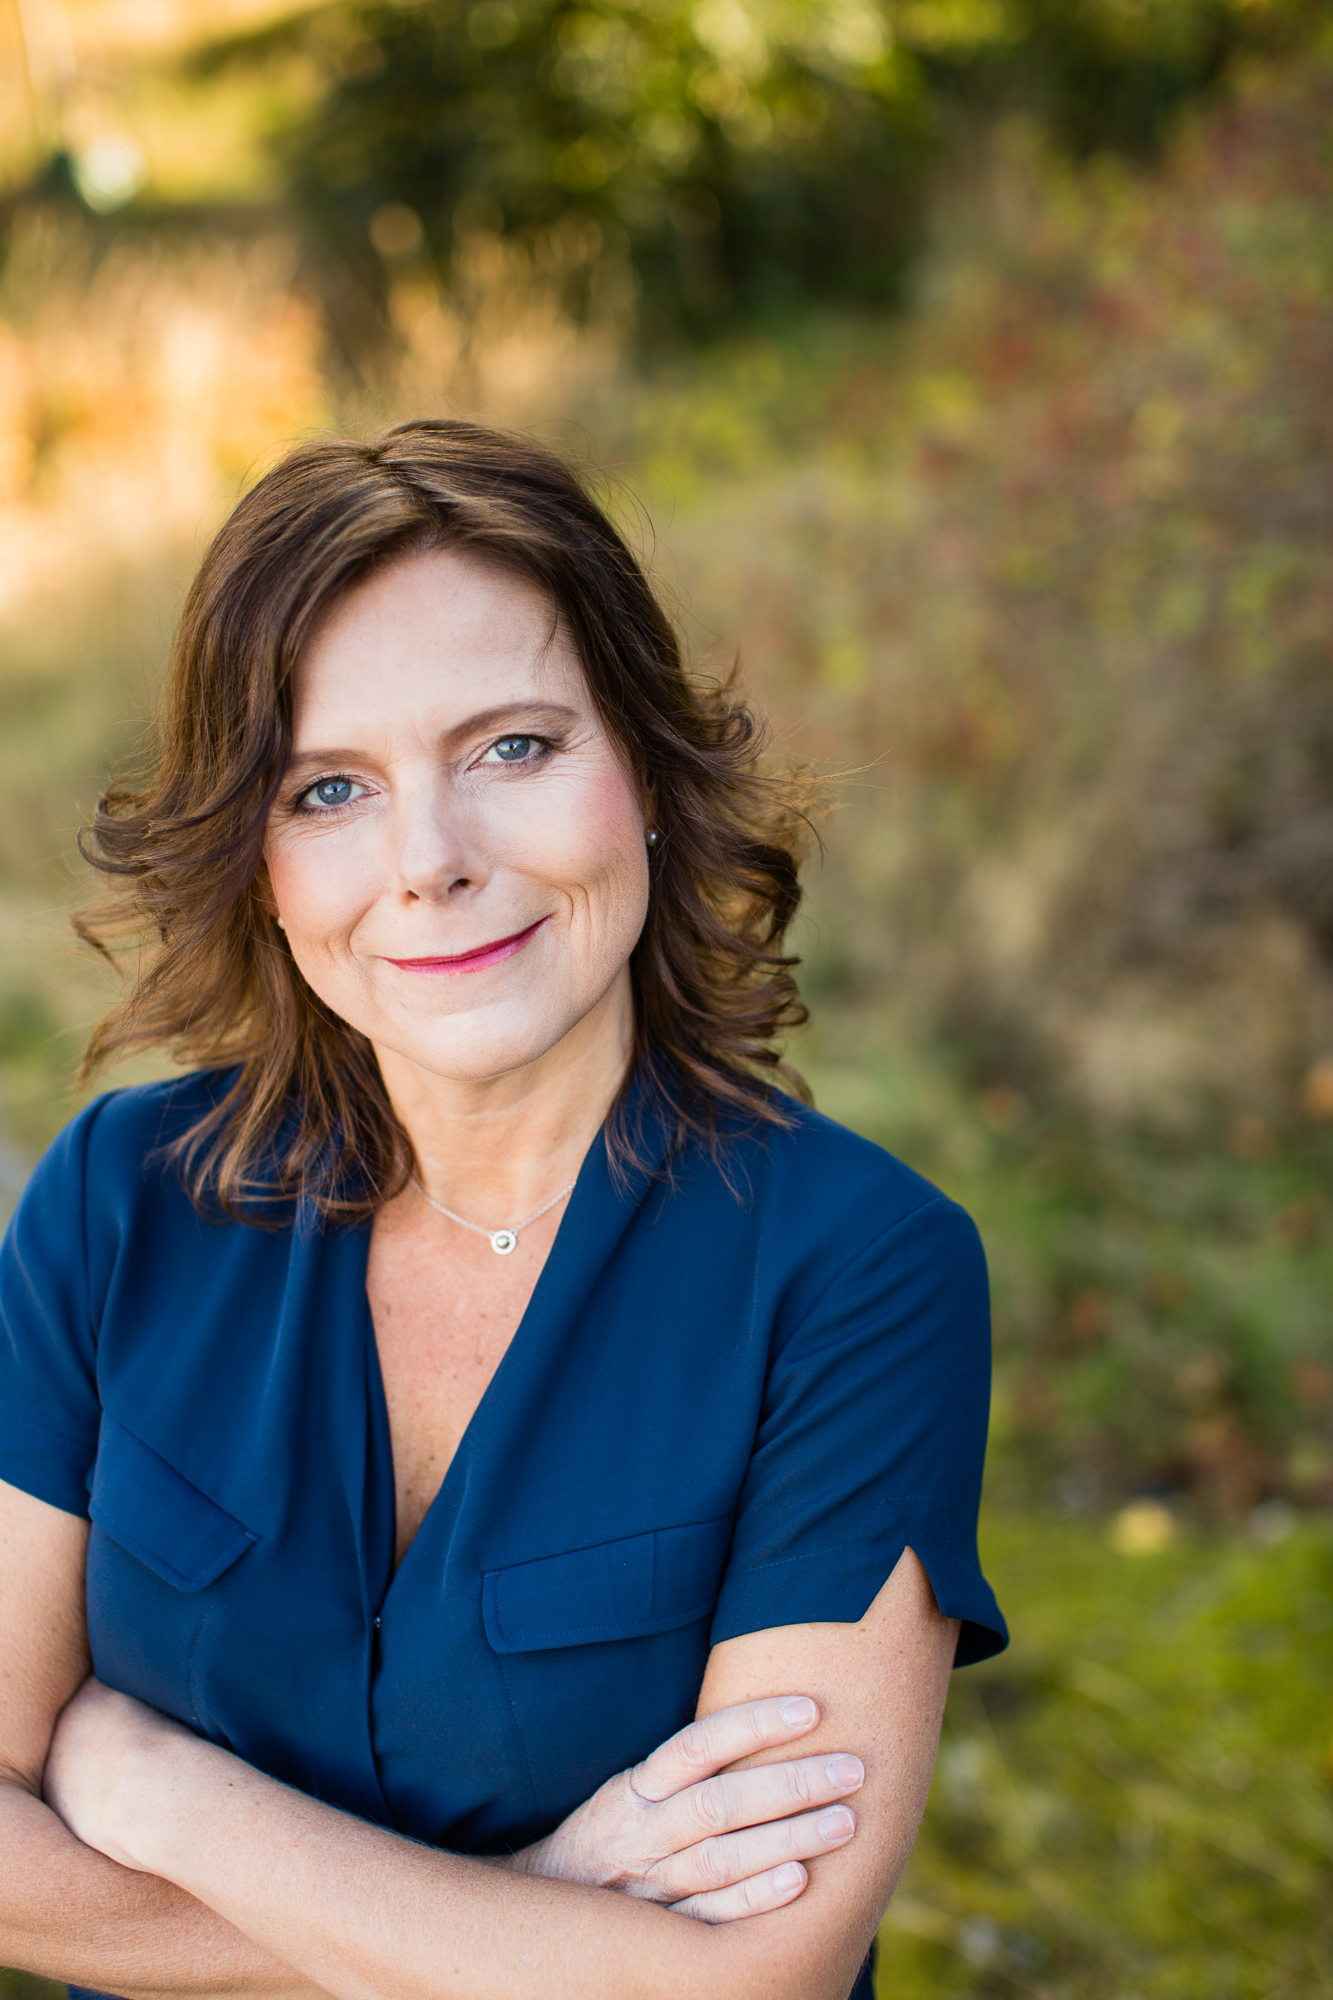 Mentor Anna-Karin LIngham